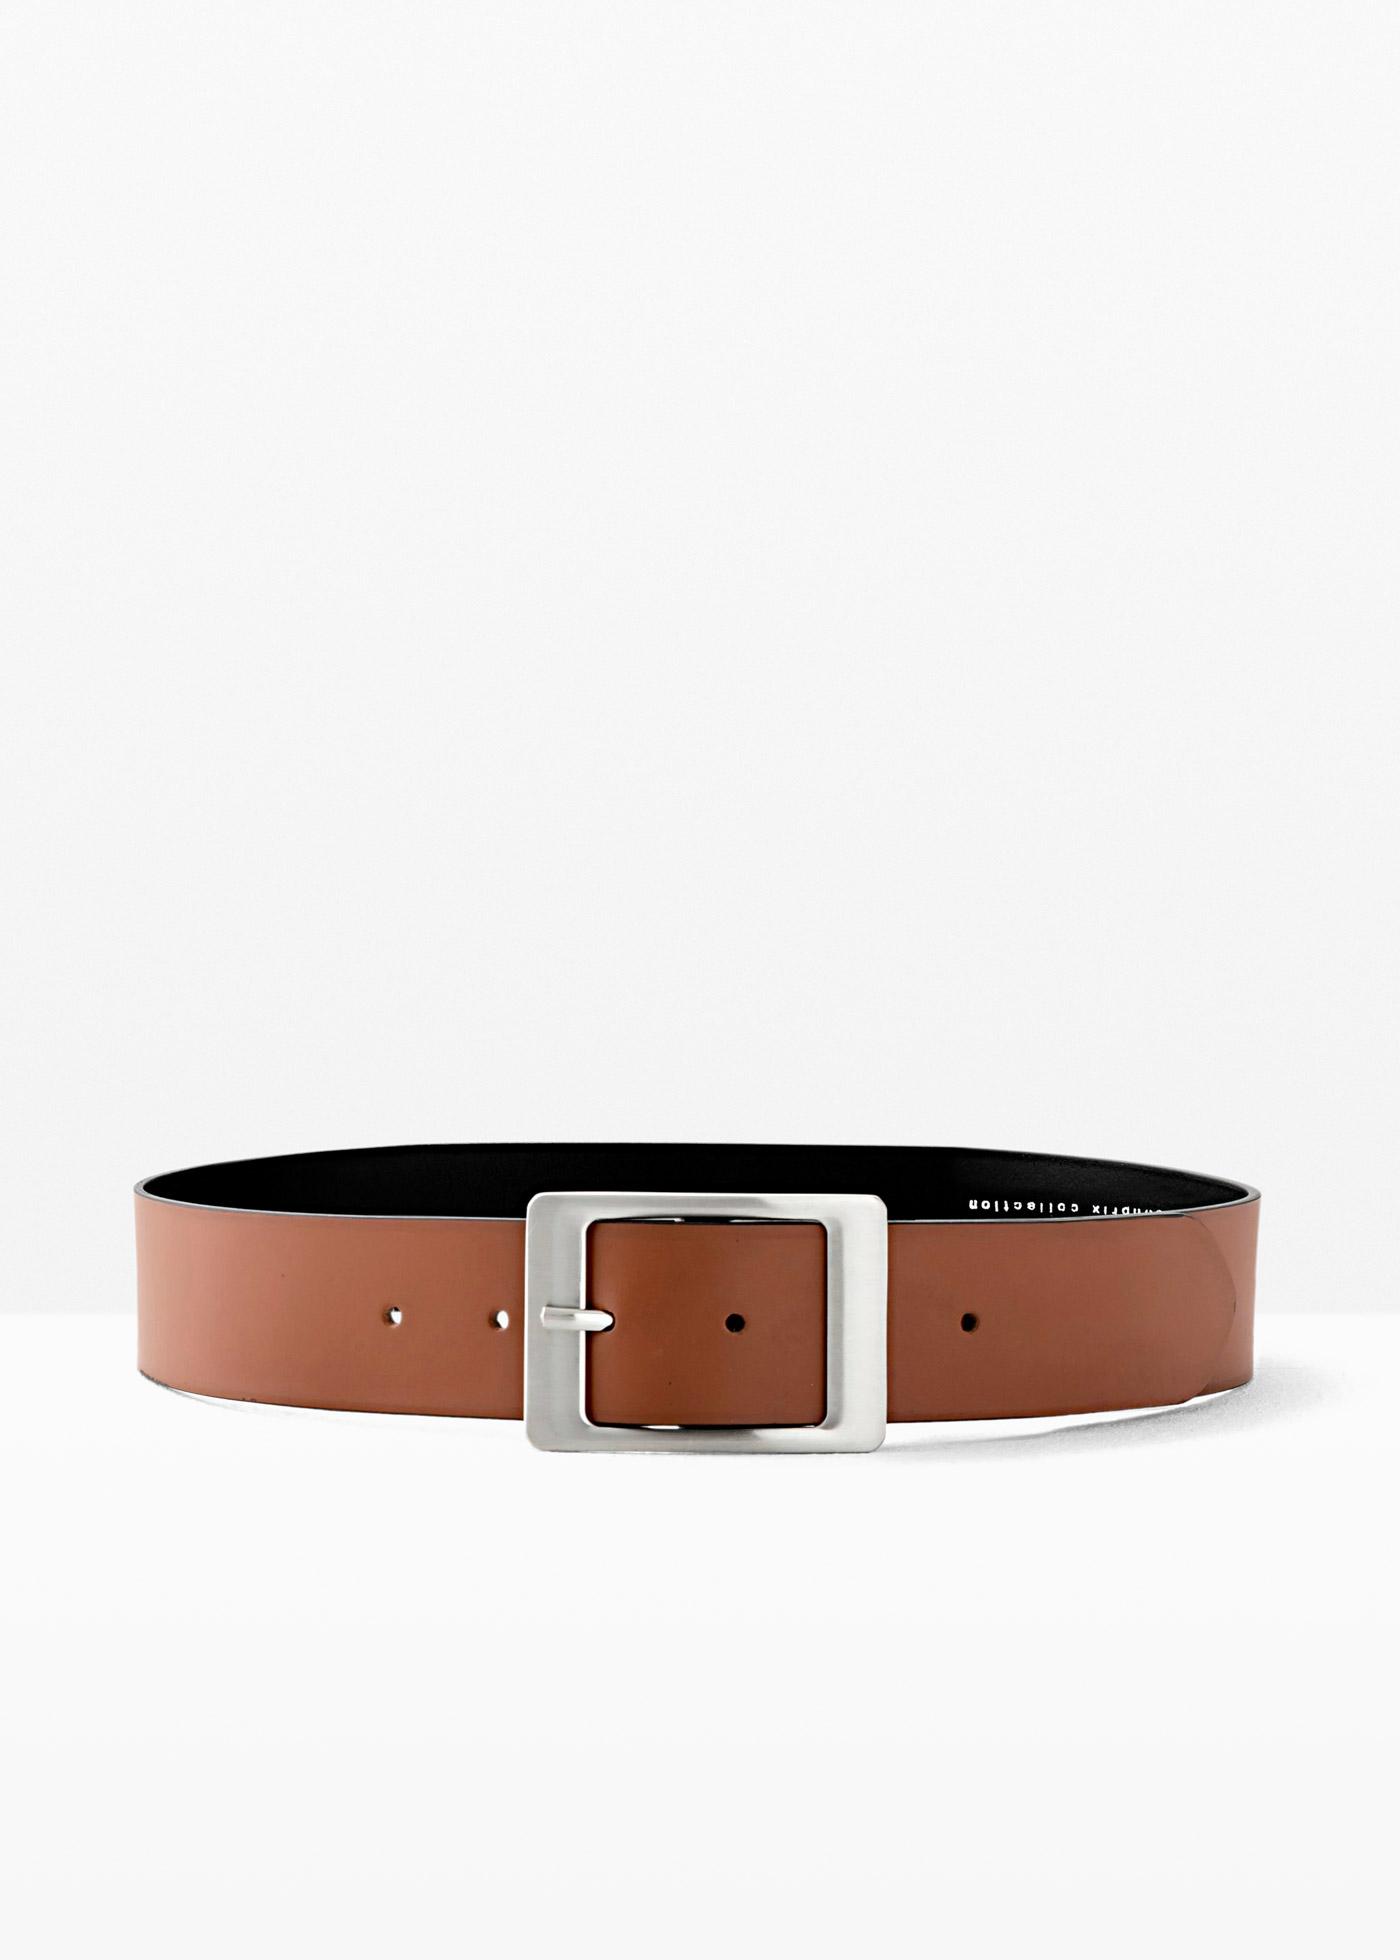 Cintura in pelle Kayla (Marrone) - bpc bonprix collection